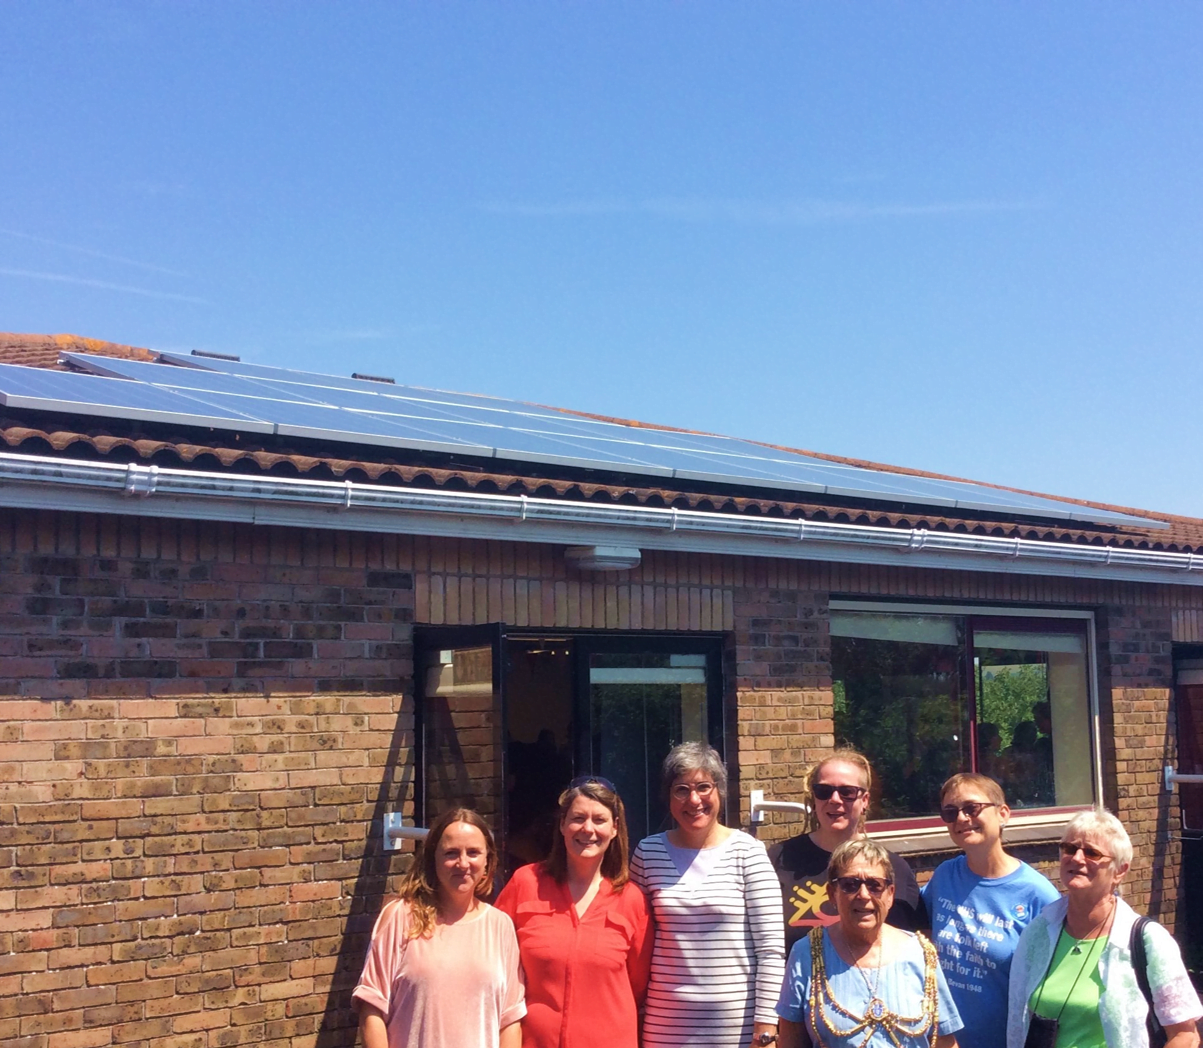 Investing In Community Energy Banner Image - Celebrating New Solar Panels at Community Centre